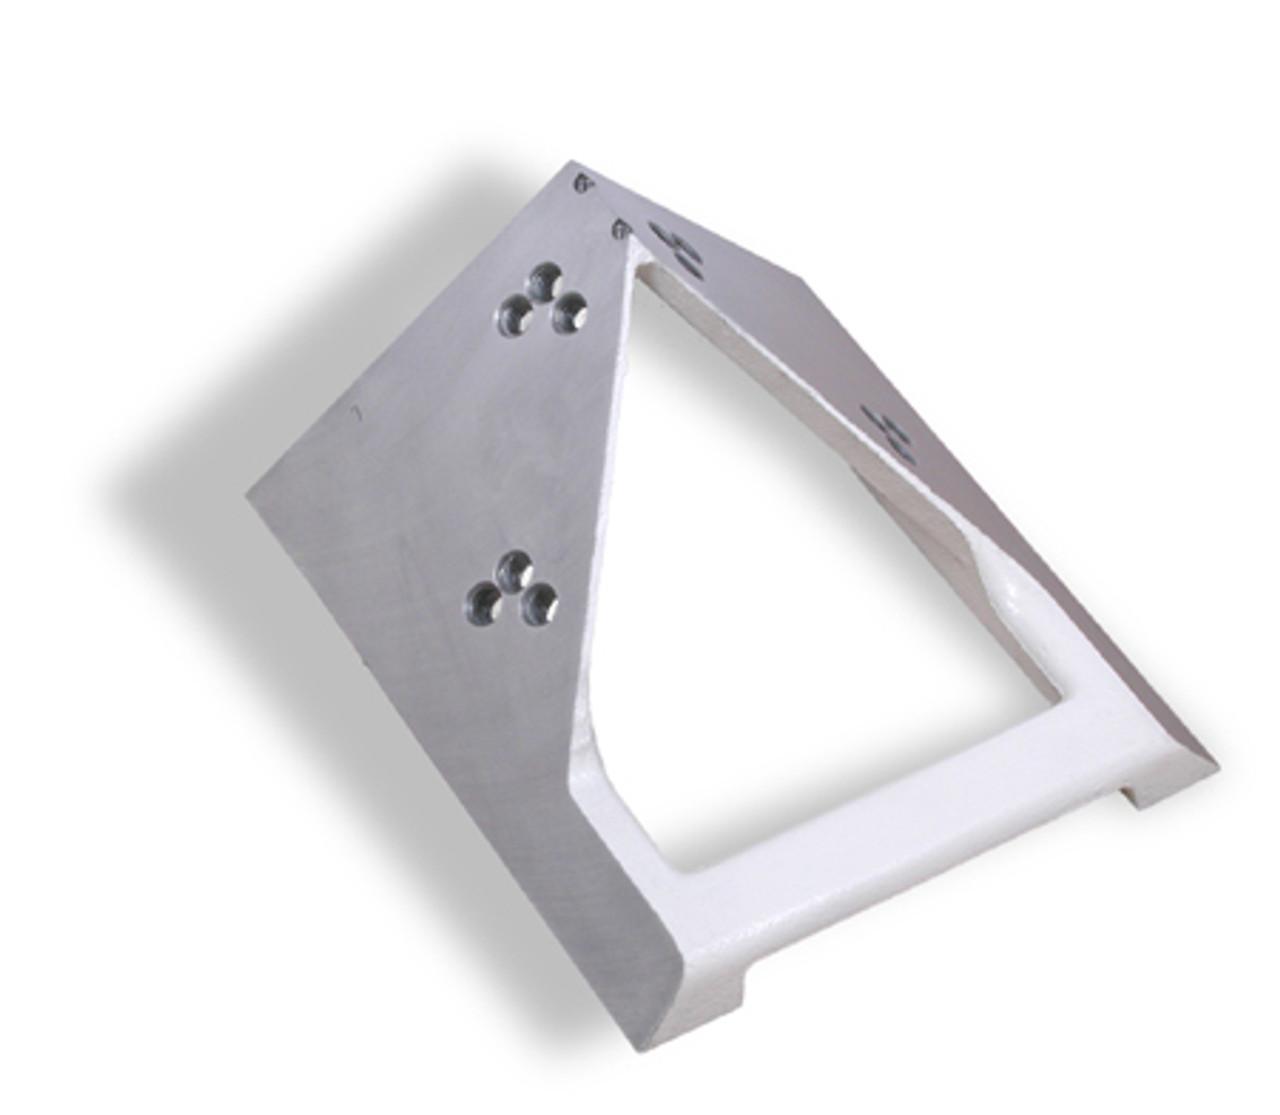 N0076-8202 Smaller cutting head for MORSO NM face frame notching machine by Hoffmann-USA.com